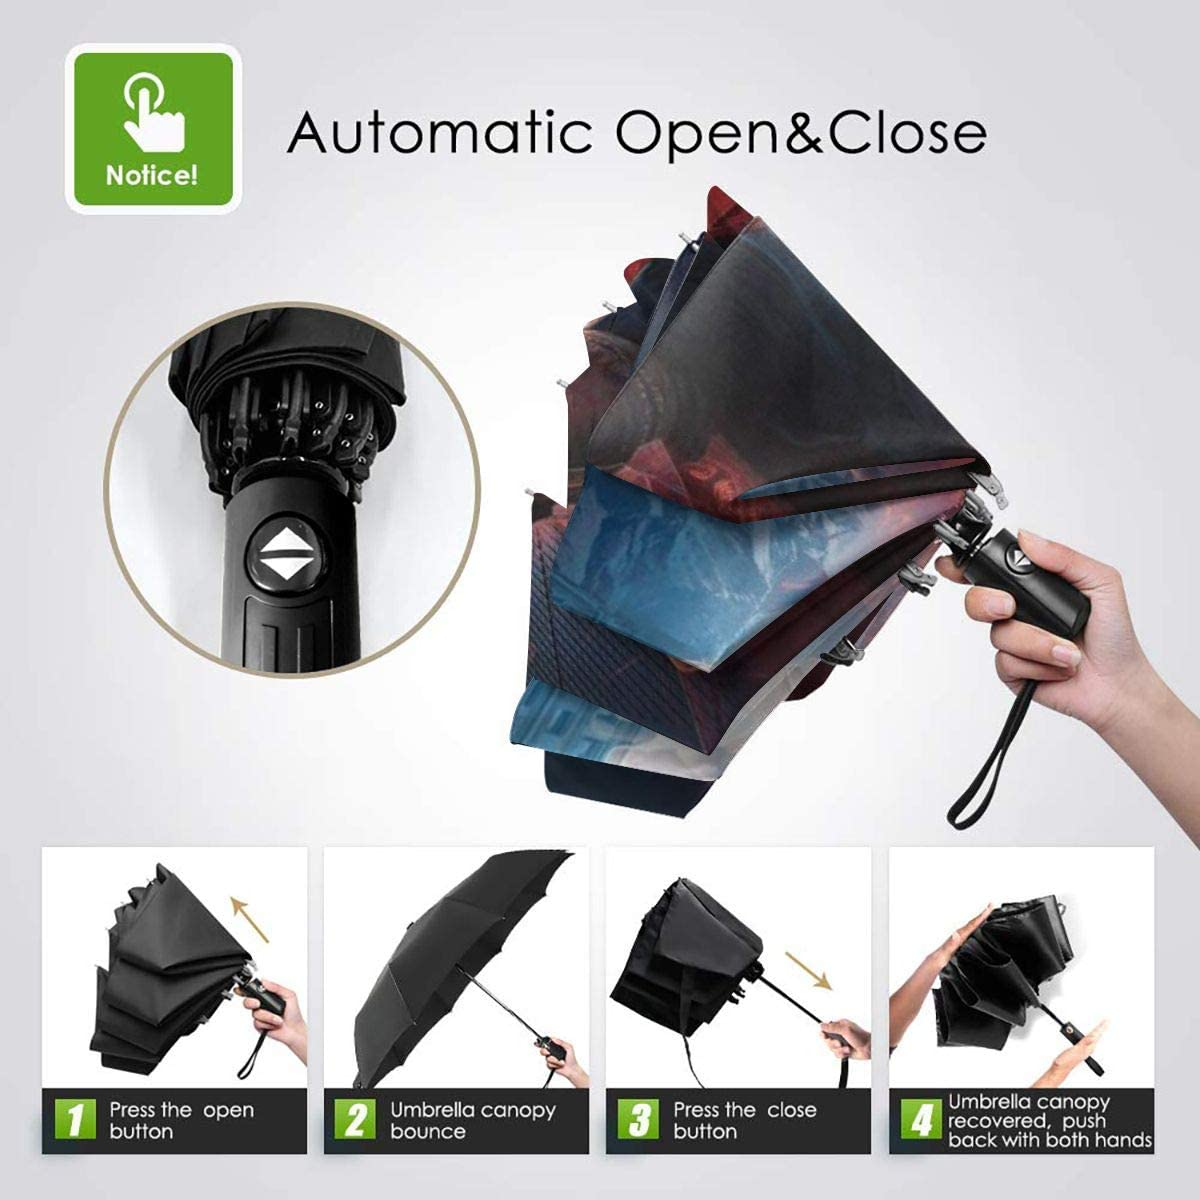 Lovesofun Portable Automatic Umbrella The Avengers Endgame Compact Auto Open Close Folding Business Umbrellas UV Protection Automatic Tri-fold Umbrella for Men and Women